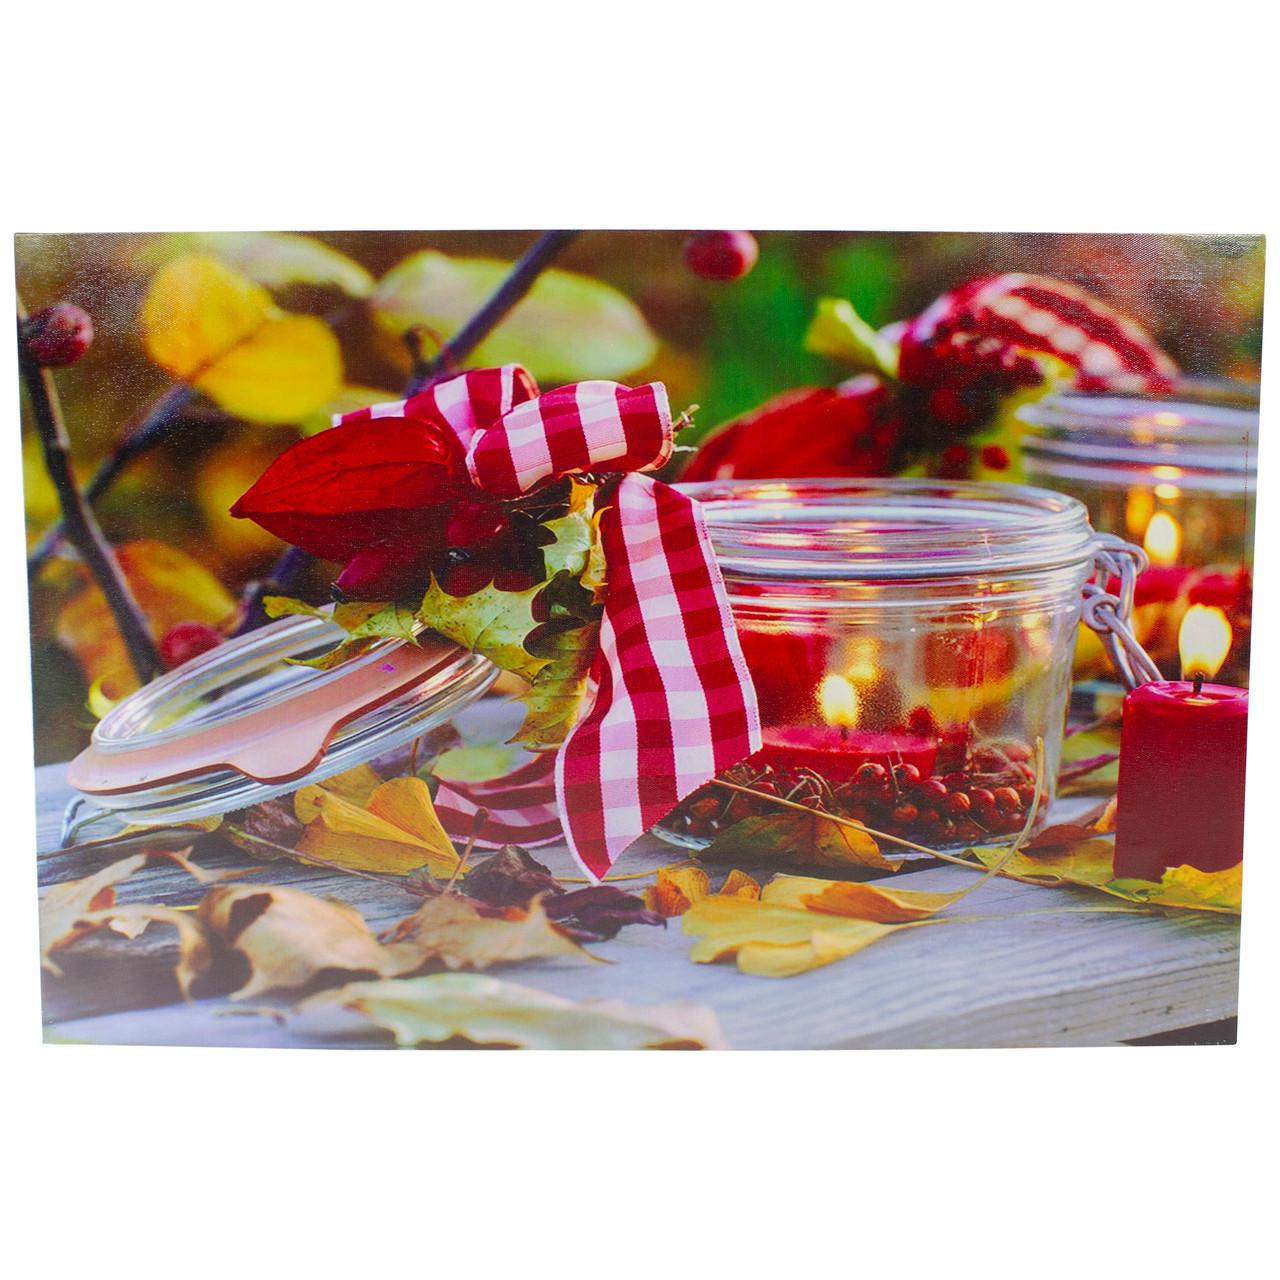 75b977ceb0d LED Lighted Fall Foliage   Lanterns Canvas Wall Art 23.5